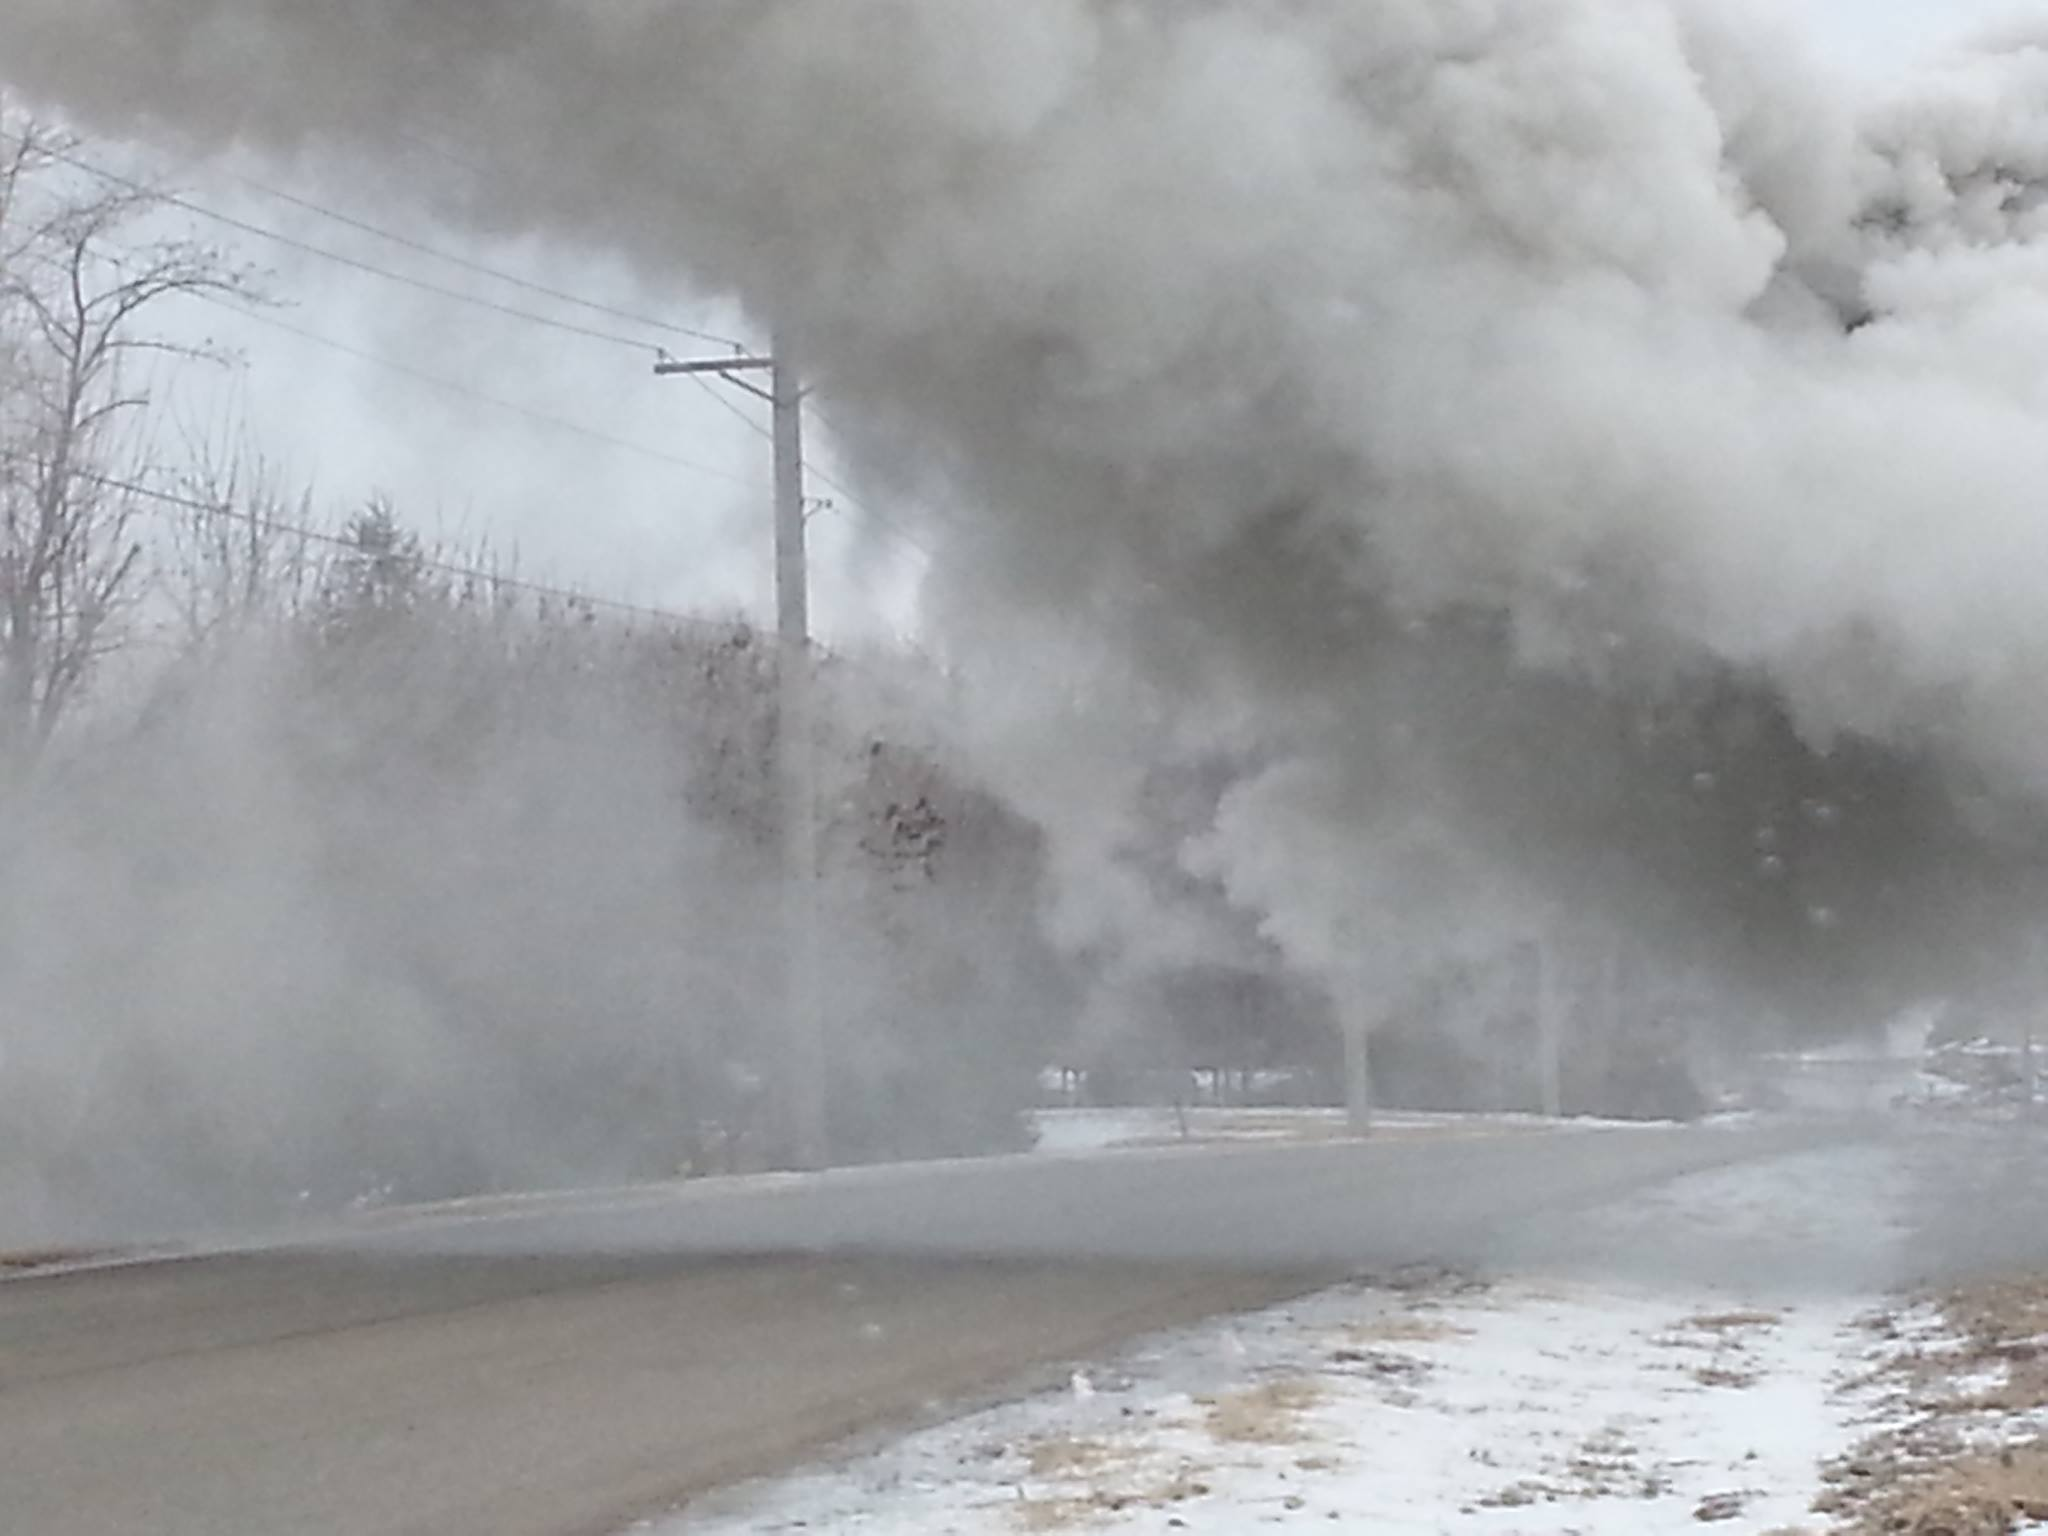 Landfill fire - February 16, 2014